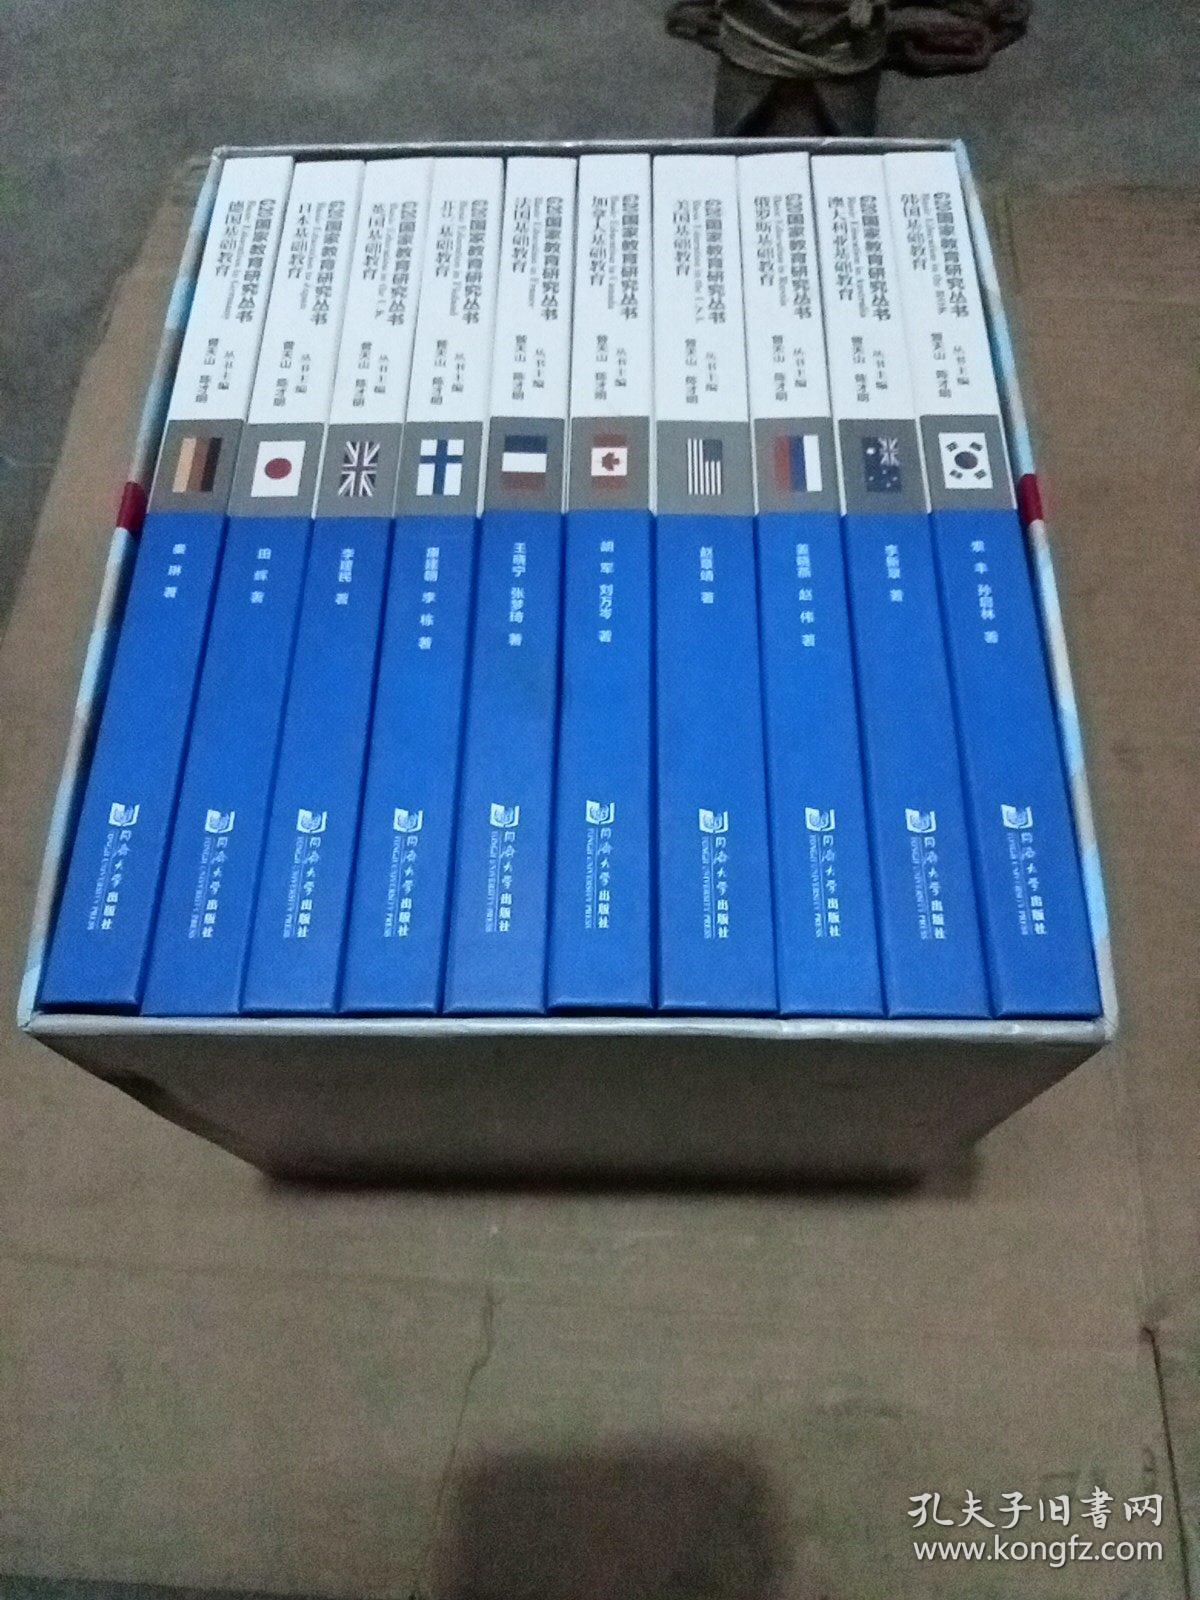 G20国家教育研究丛书:日本,美国,俄罗斯,英国,法国,德国,加拿大,澳大利亚,韩国,芬兰.【全十册合售】